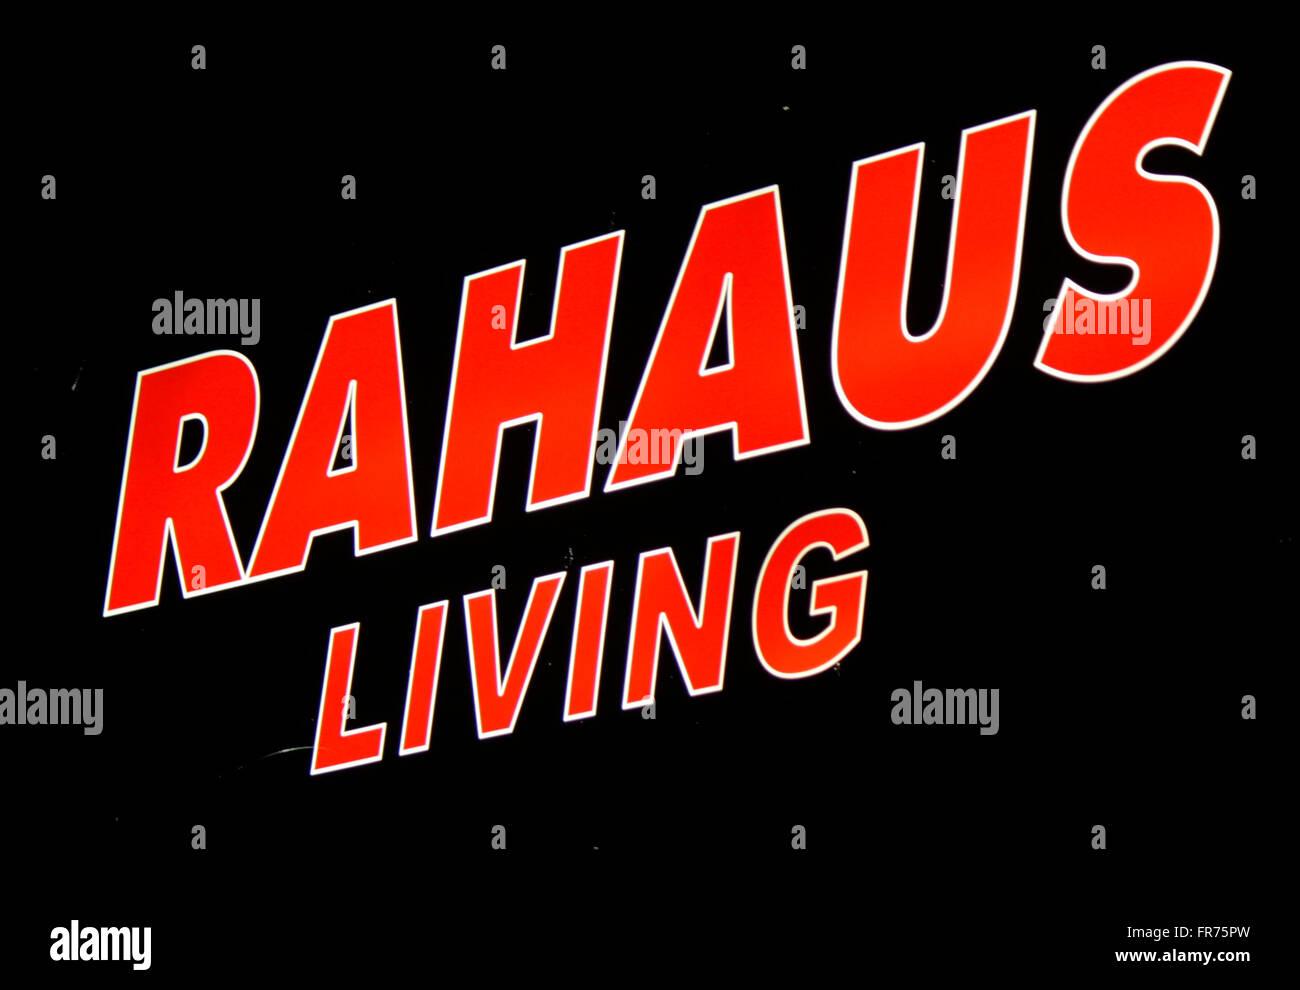 Rahaus Berlin markenname rahaus living berlin stock photo royalty free image